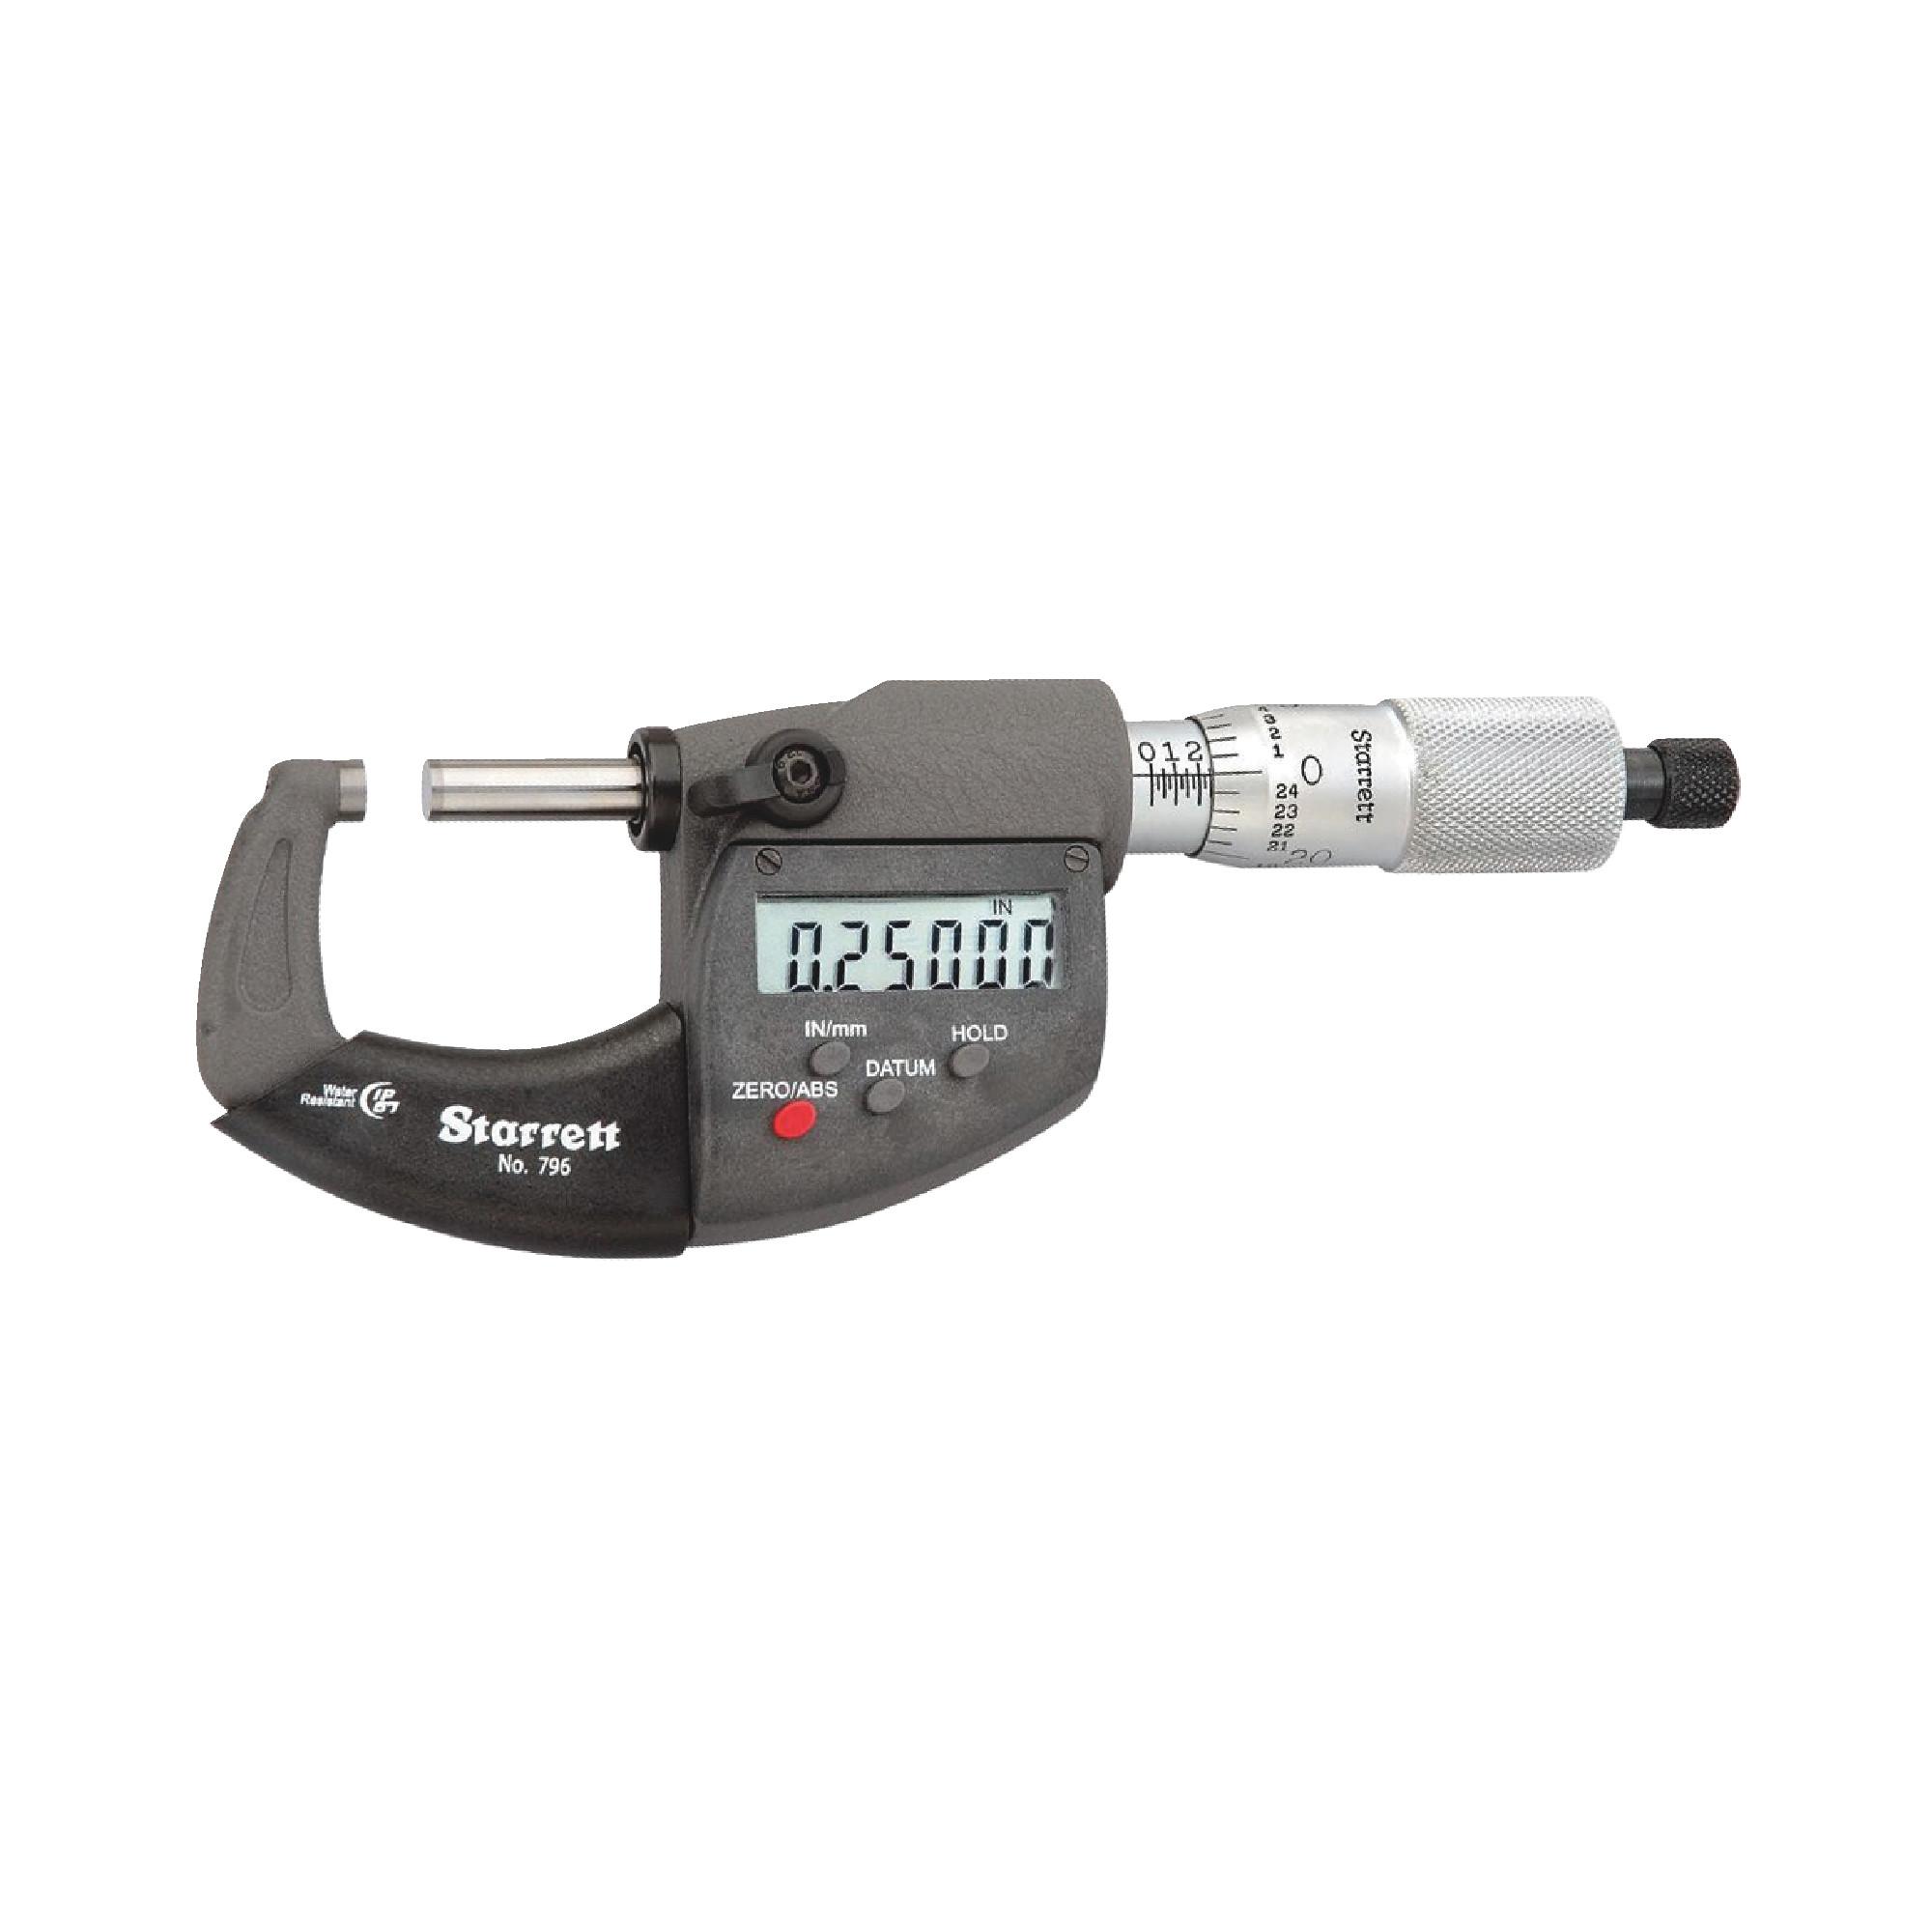 "0-1"" IP67 Ratchet Stop Electronic Micrometer"